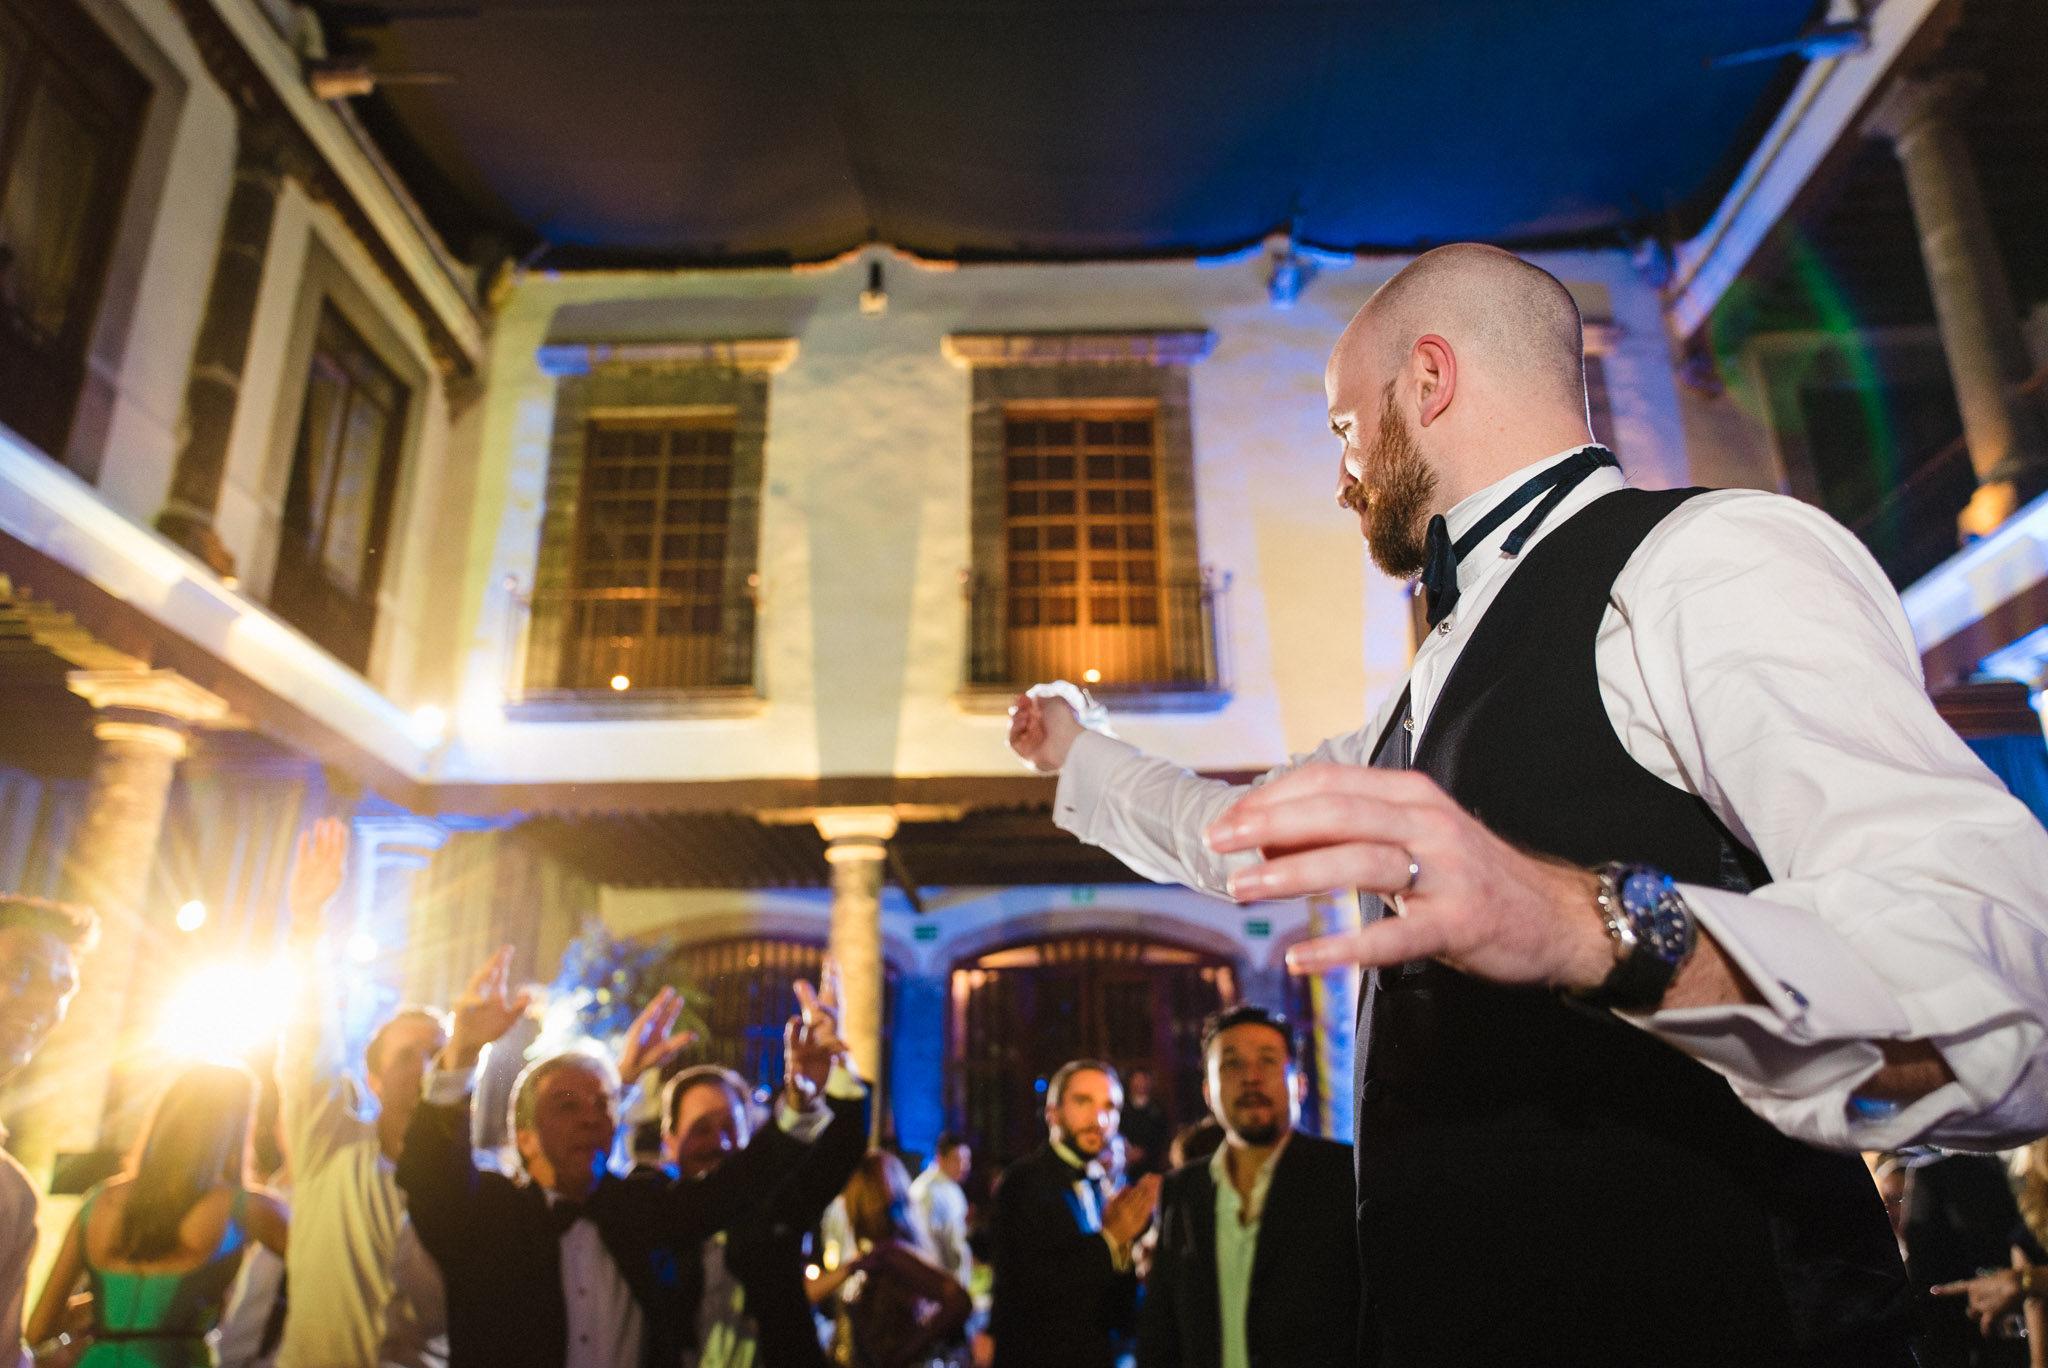 ©www.mauriziosolisbroca.com-20161002maurizio-solis-broca-mexico-canada-wedding-photographer20161002DSC00473-2-Edit.jpg